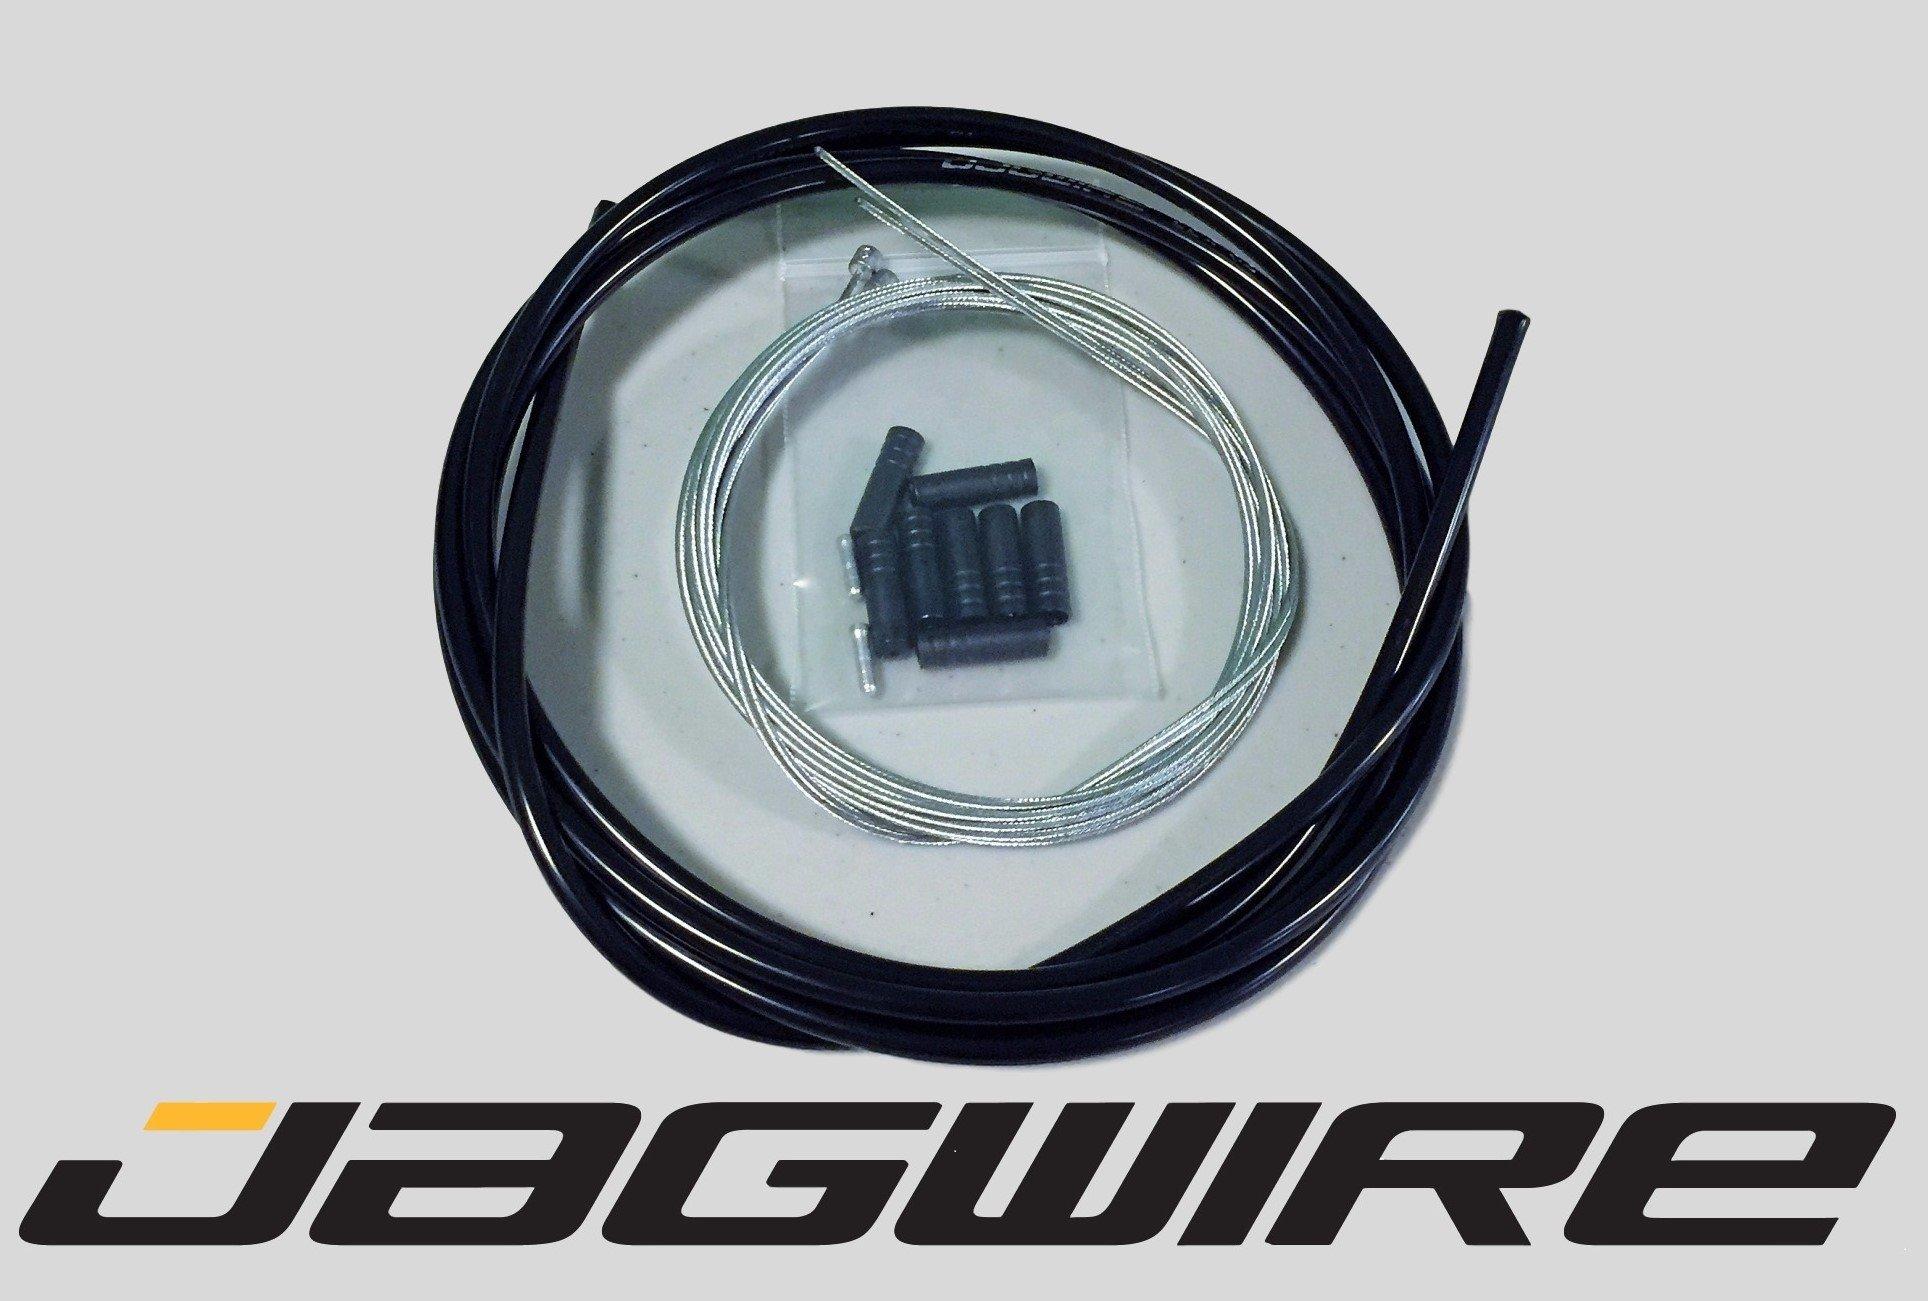 JAGWIRE ROAD Shop Kit - Shifter / Derailleur Cable & Housing Kit - SRAM/Shimano